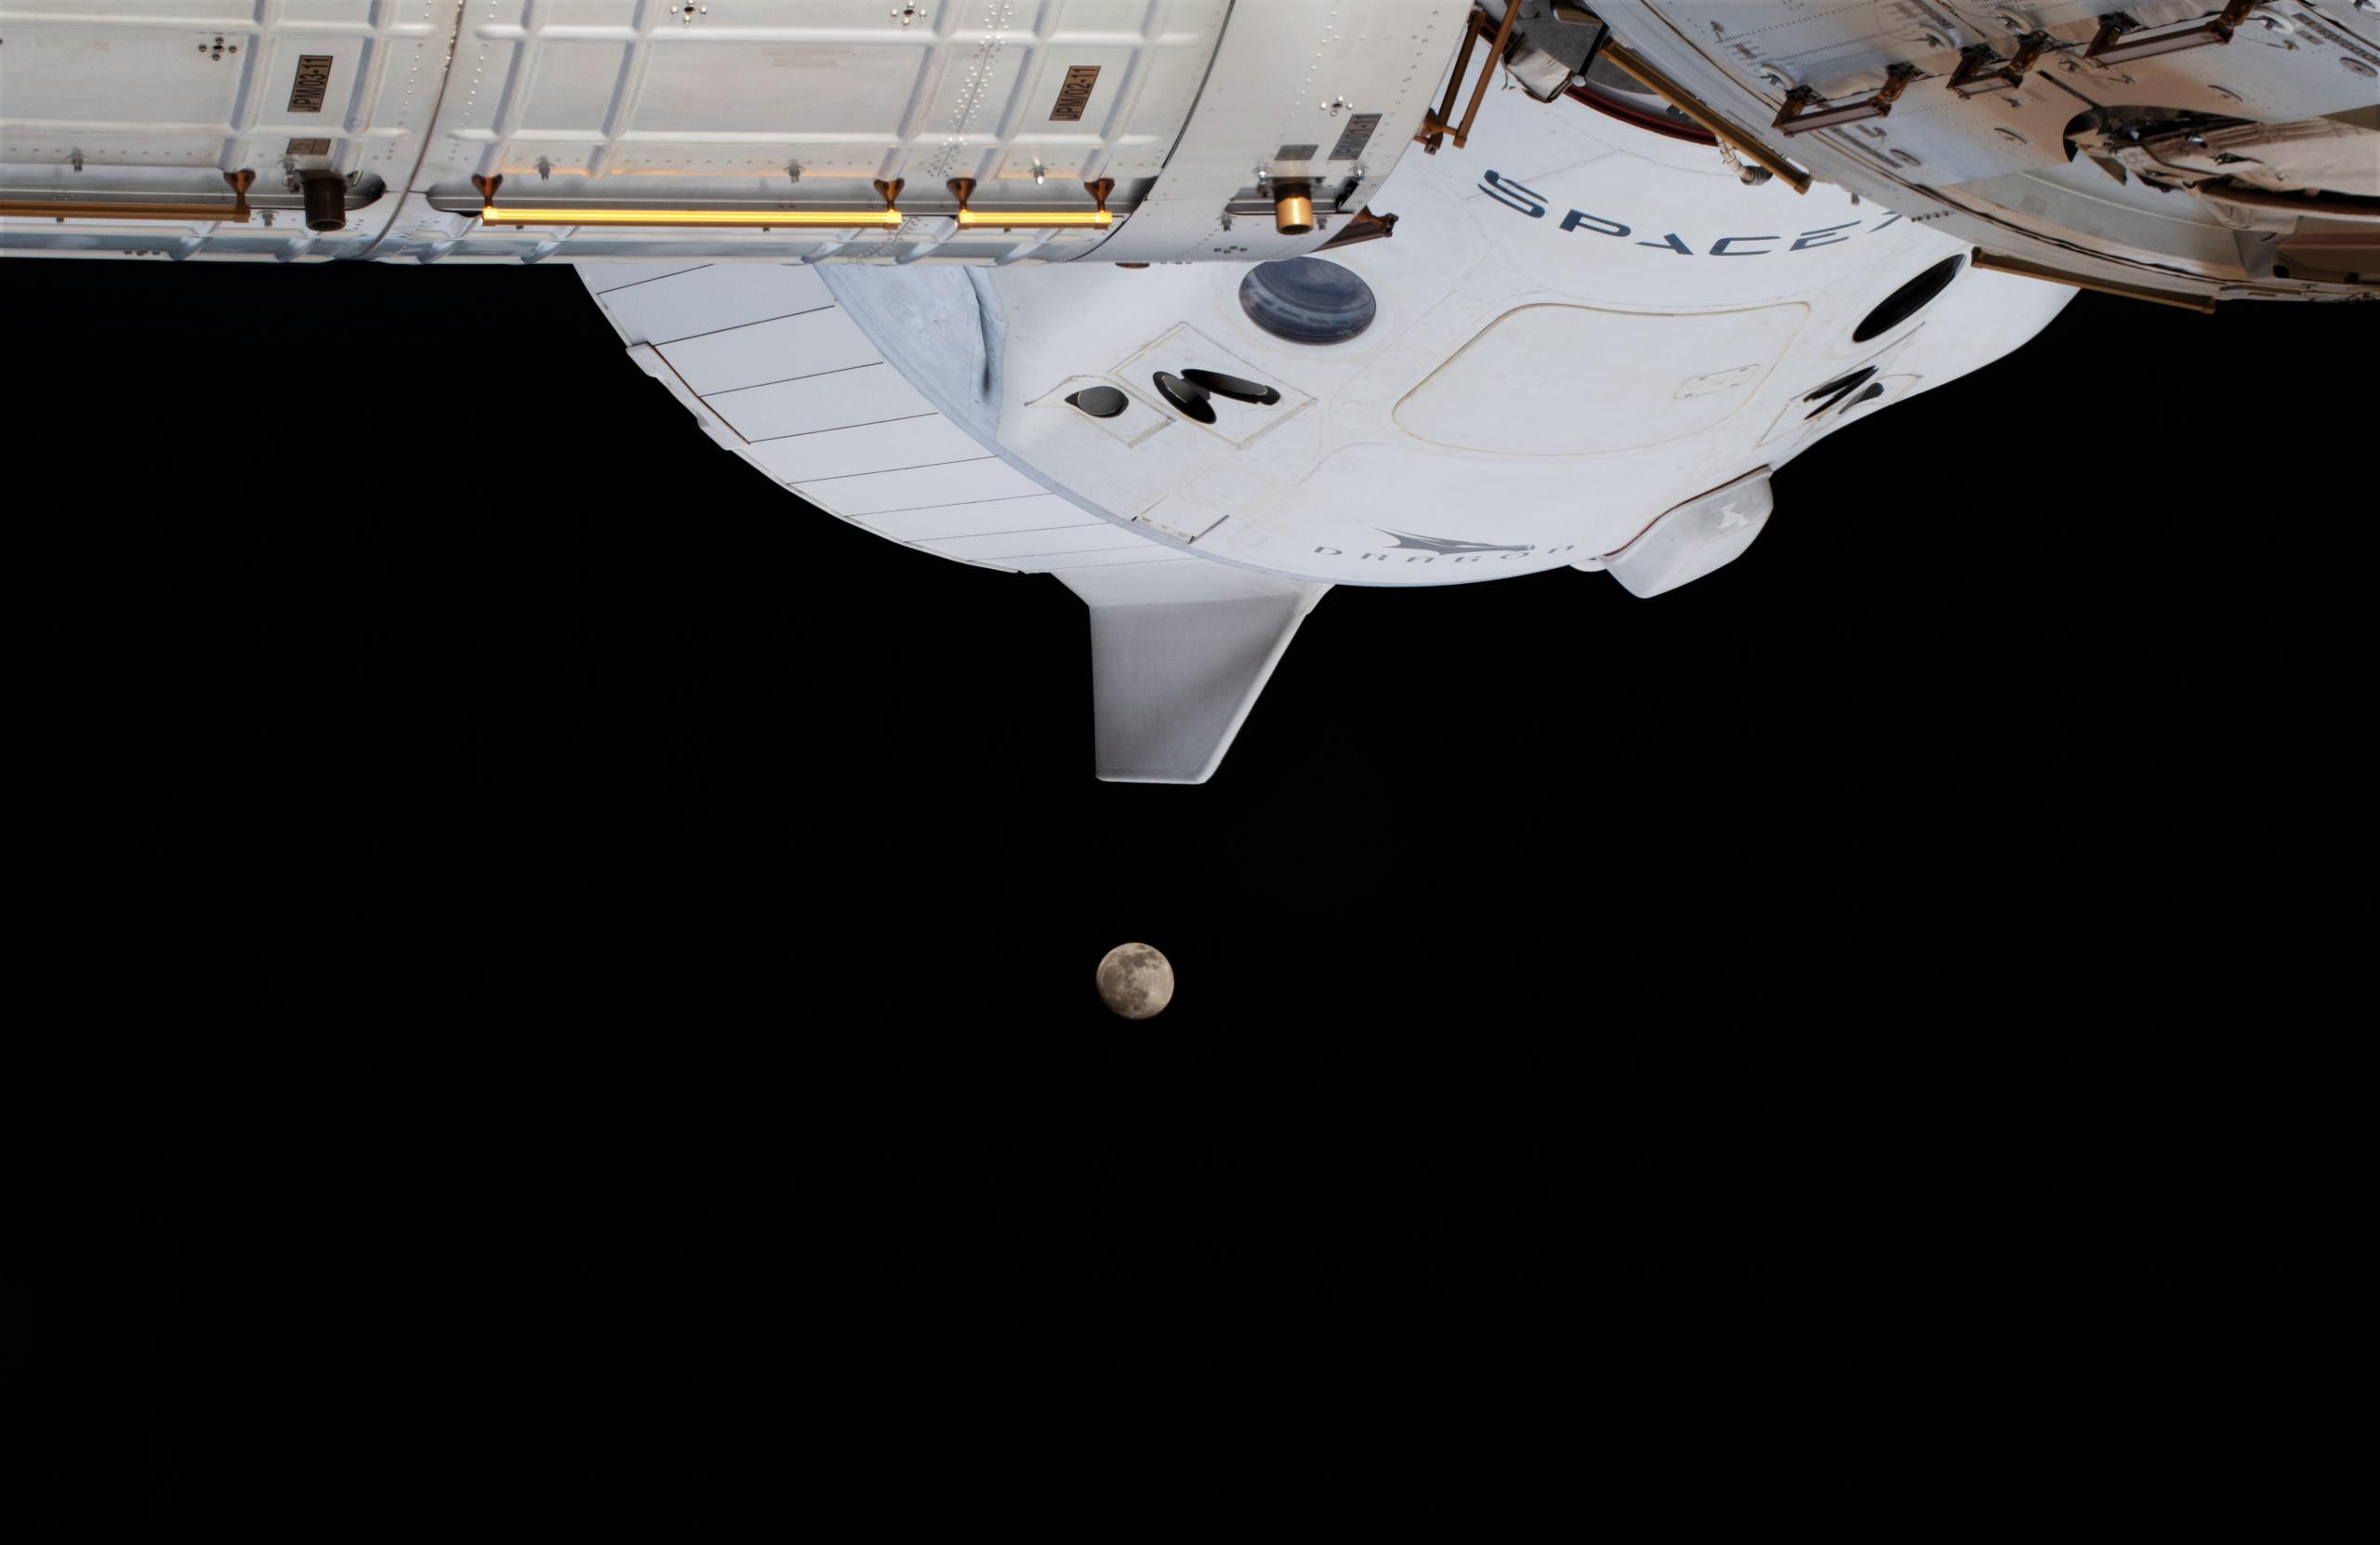 Crew Dragon C207 Crew-1 ISS 012621 (NASA) Moon eclipse 5 crop (c)